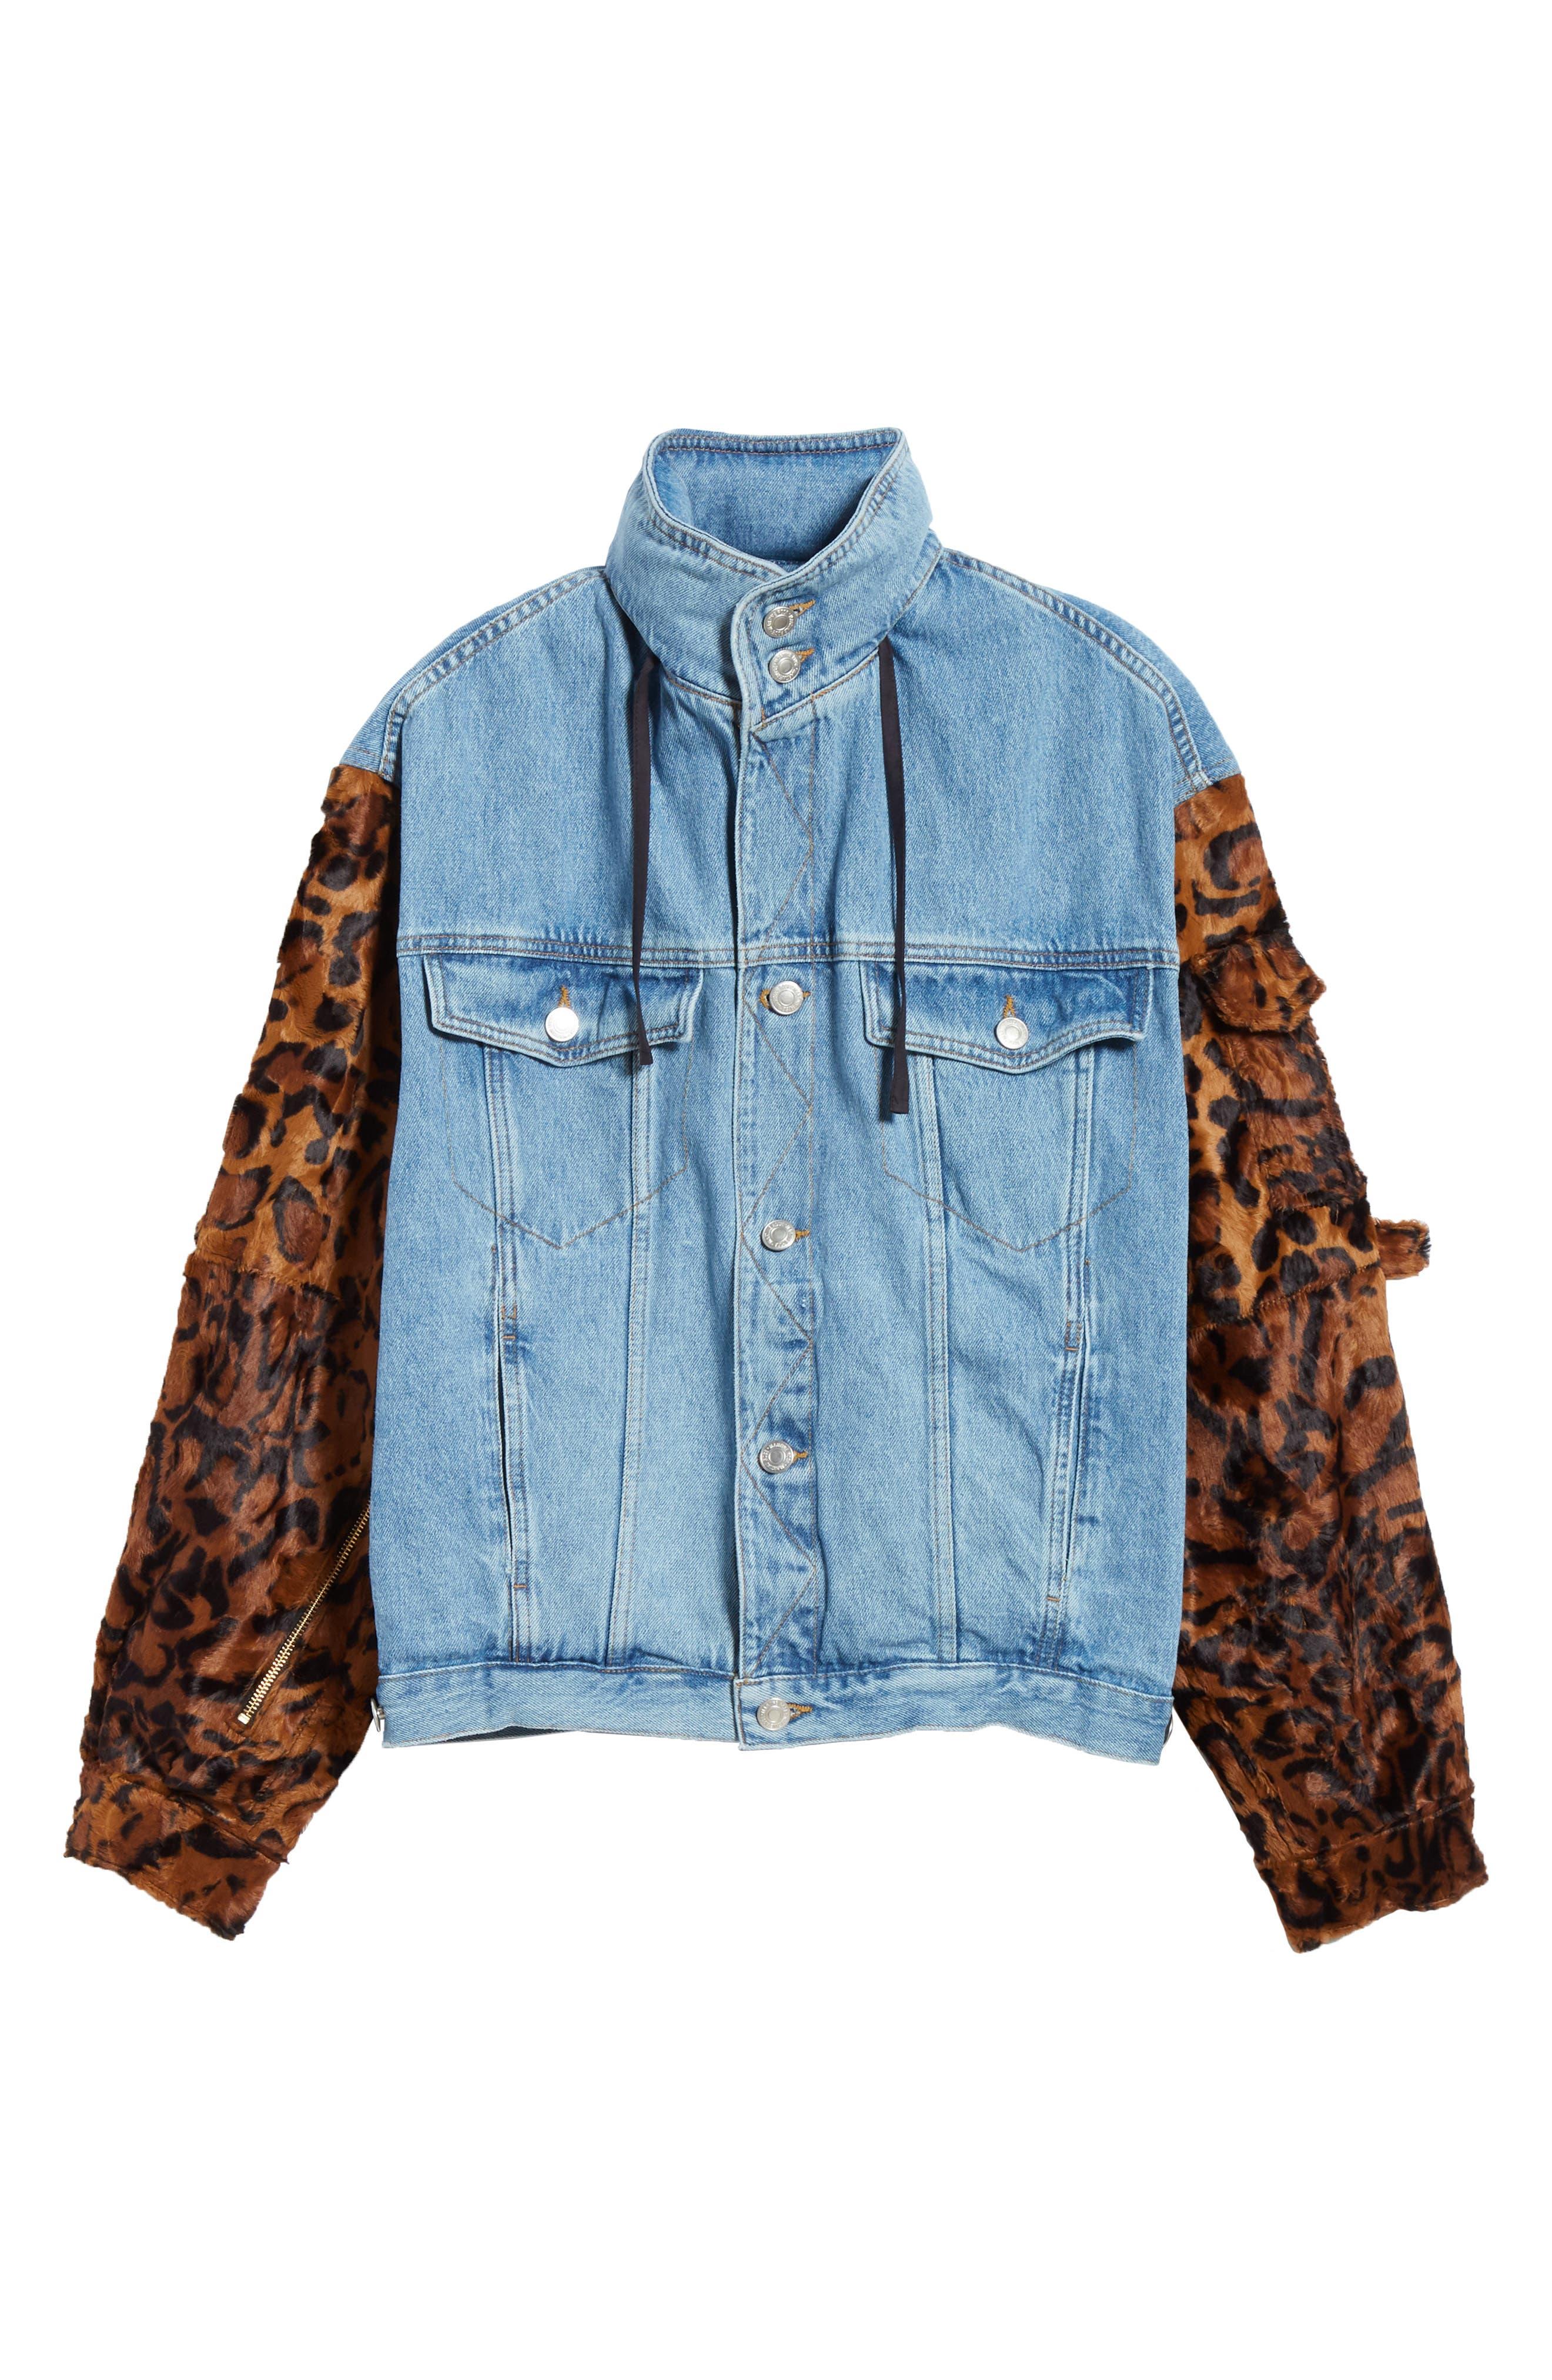 MARTINE ROSE, Leopard Hooded Denim Jacket, Alternate thumbnail 6, color, LIGHT DENIM DARK